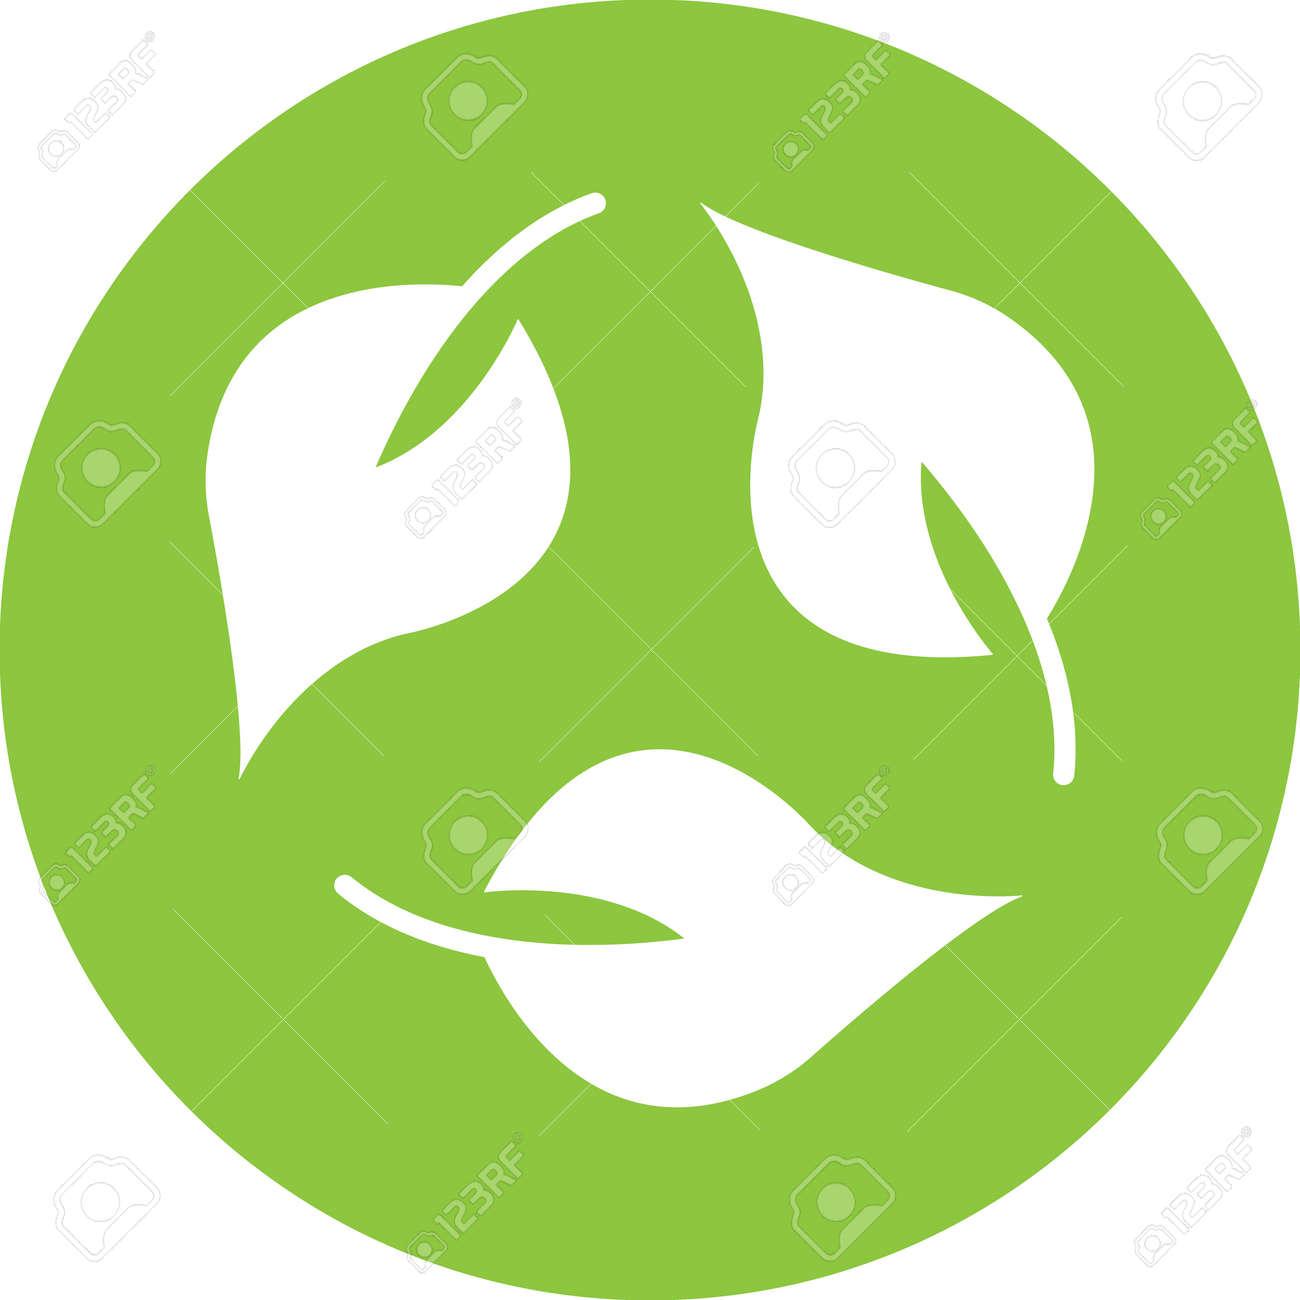 recycling leaf icon illustration - 165839477